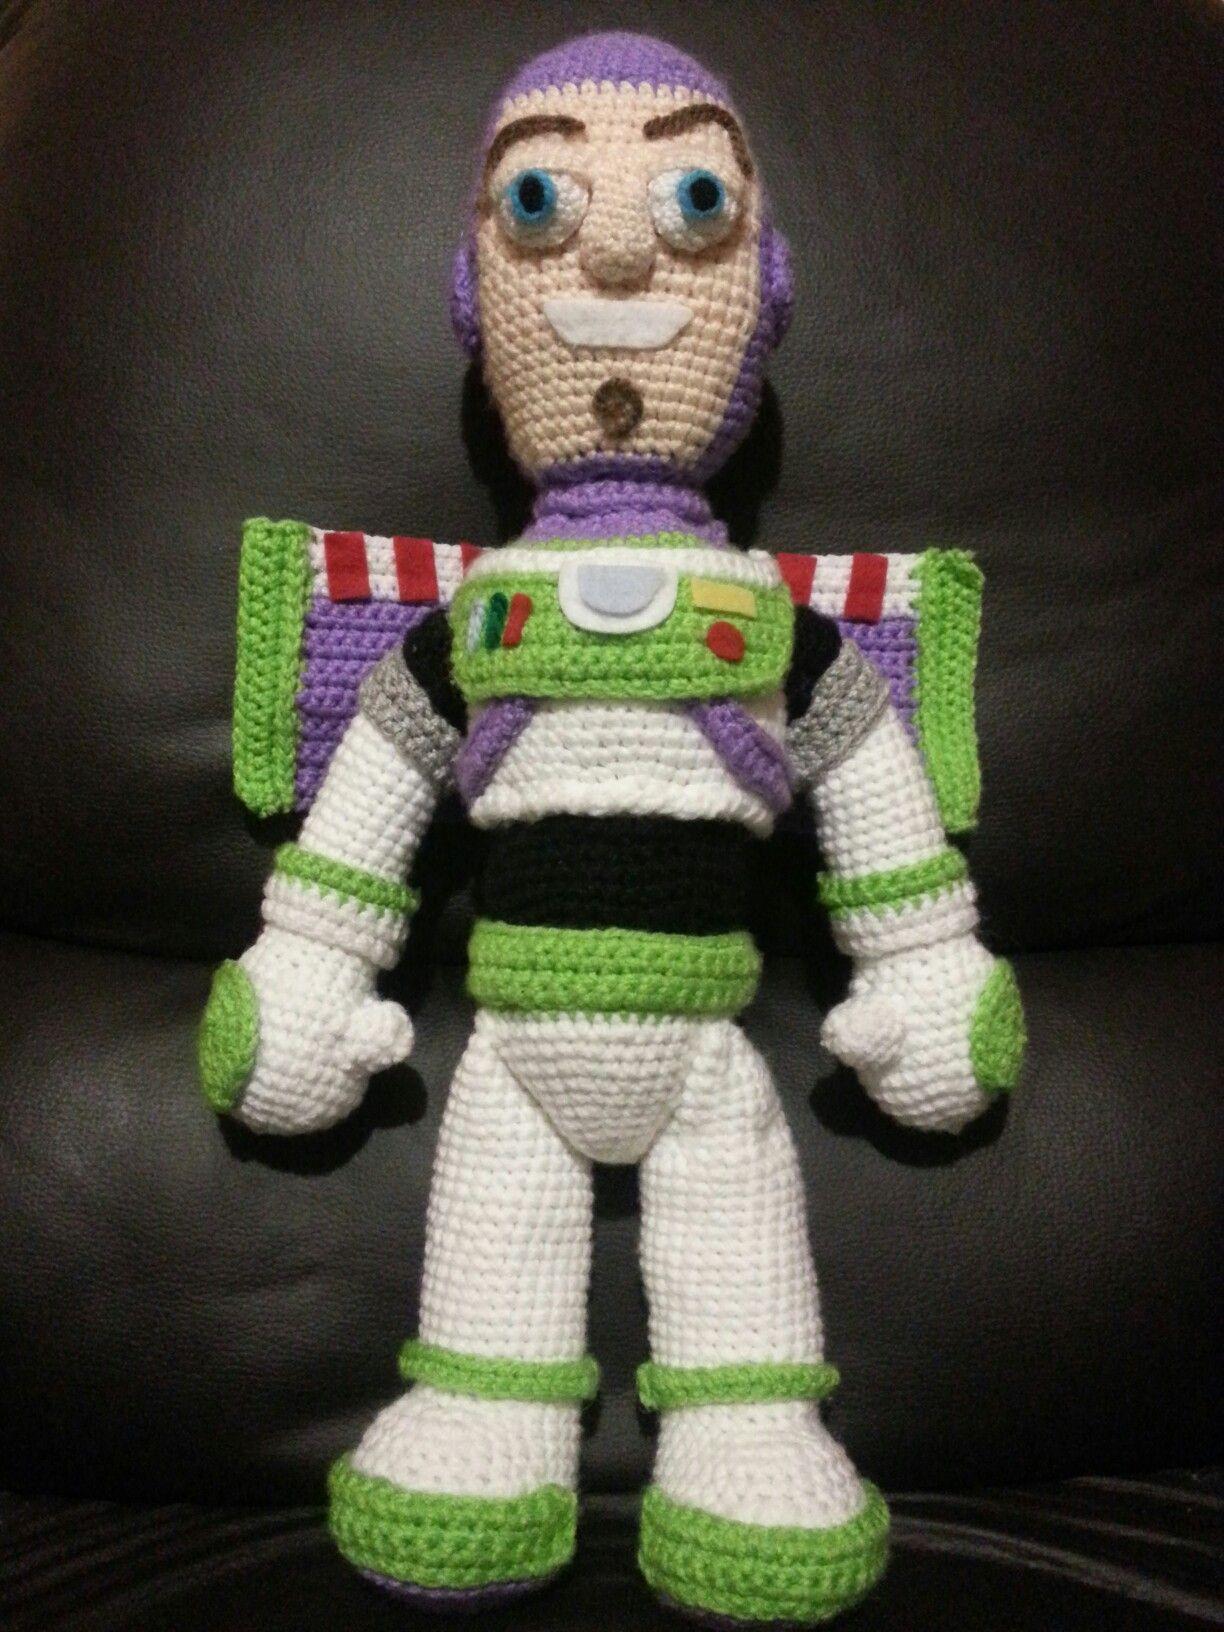 Buzz Lightyear Amigurumi | Knitting / Crochet | Pinterest | Patrones ...